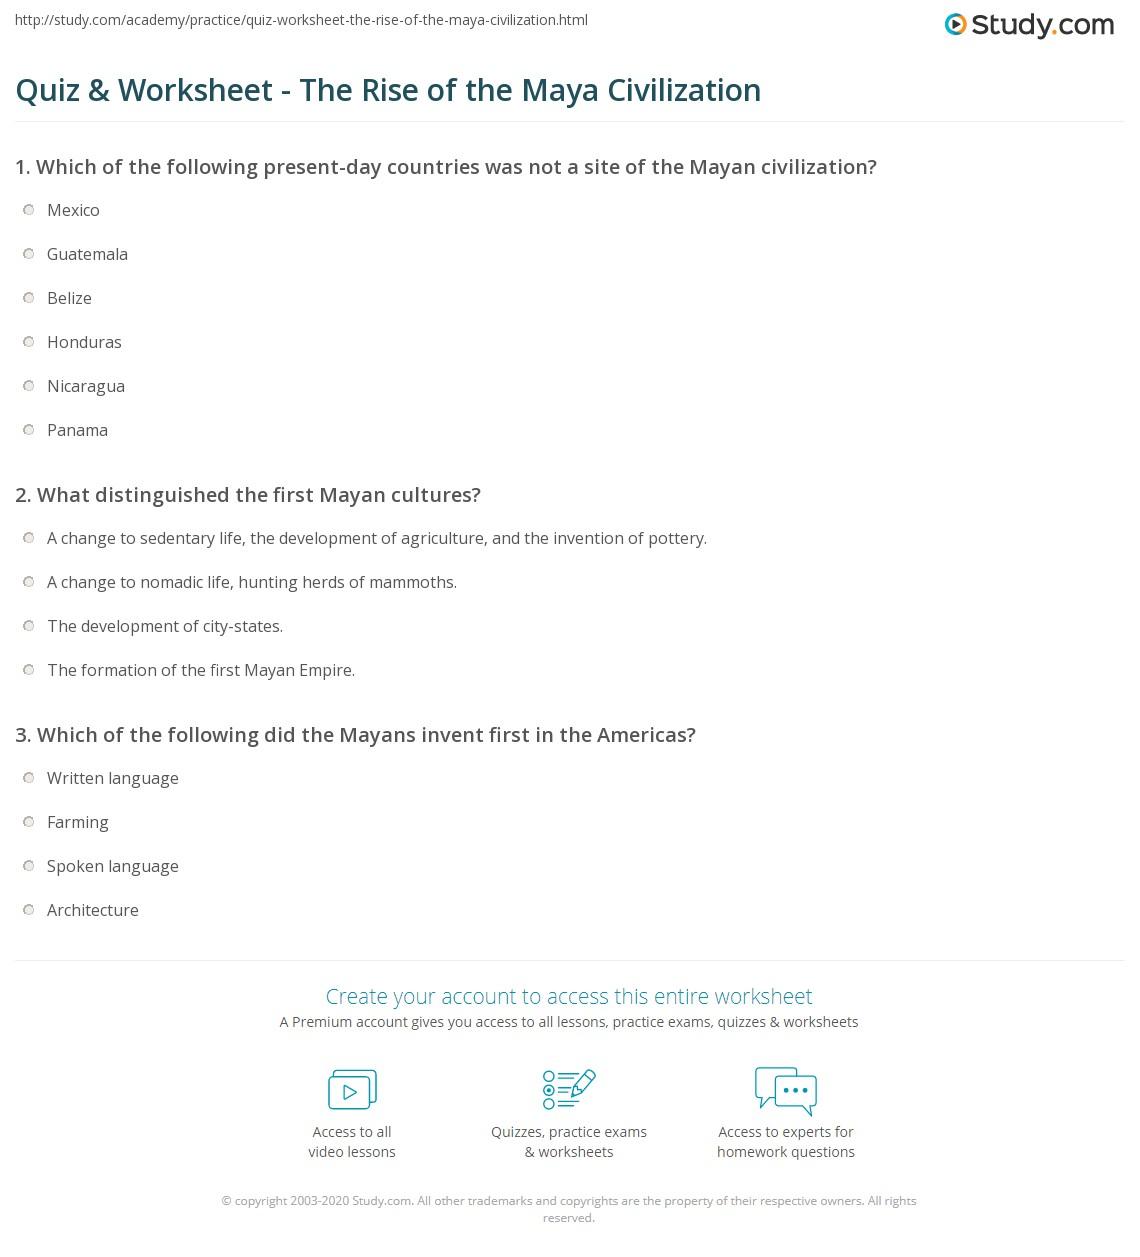 Quiz & Worksheet - The Rise of the Maya Civilization | Study.com